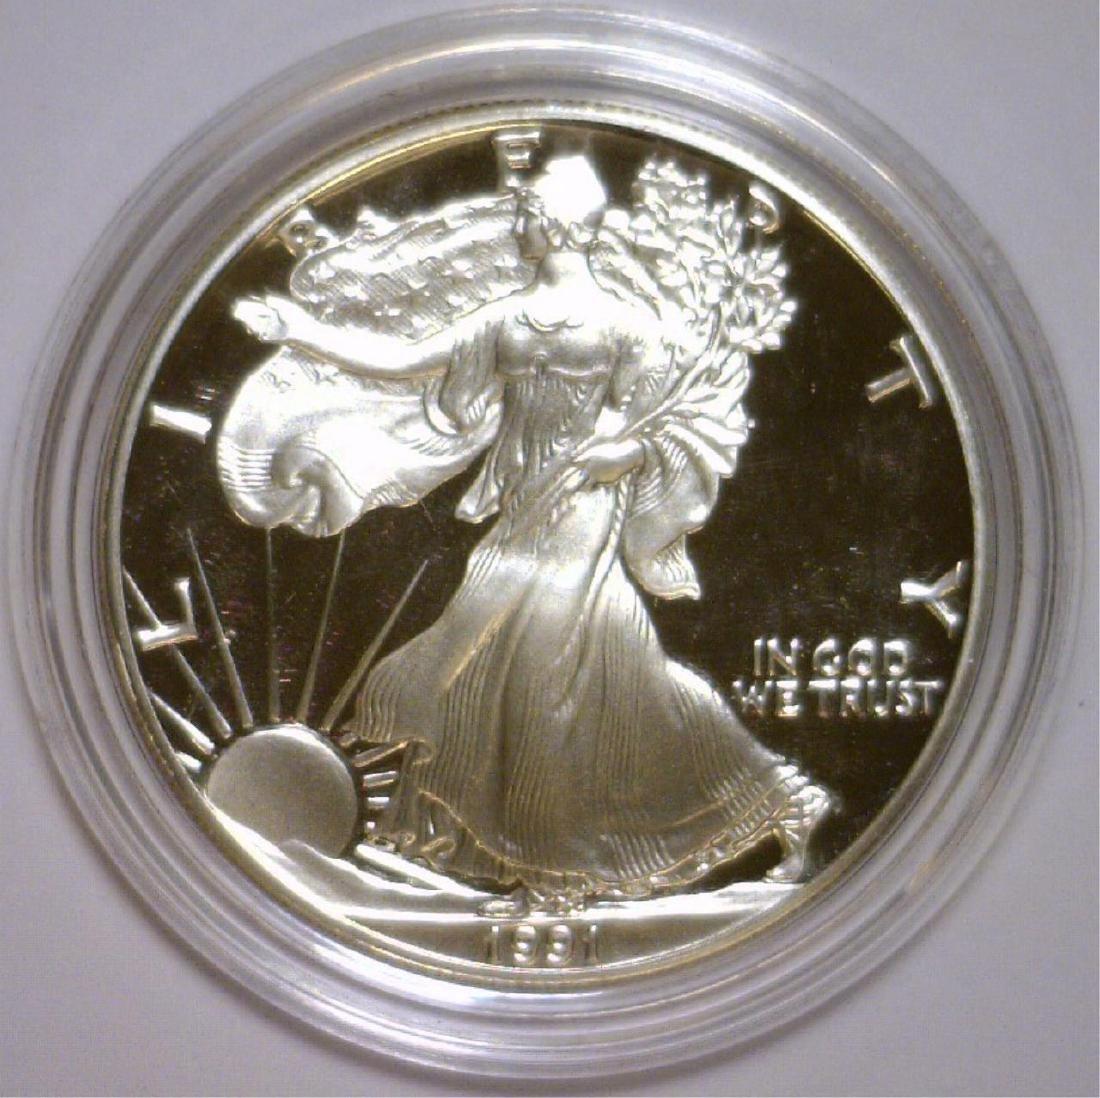 1991 Silver American Eagle Proof with Box & COA